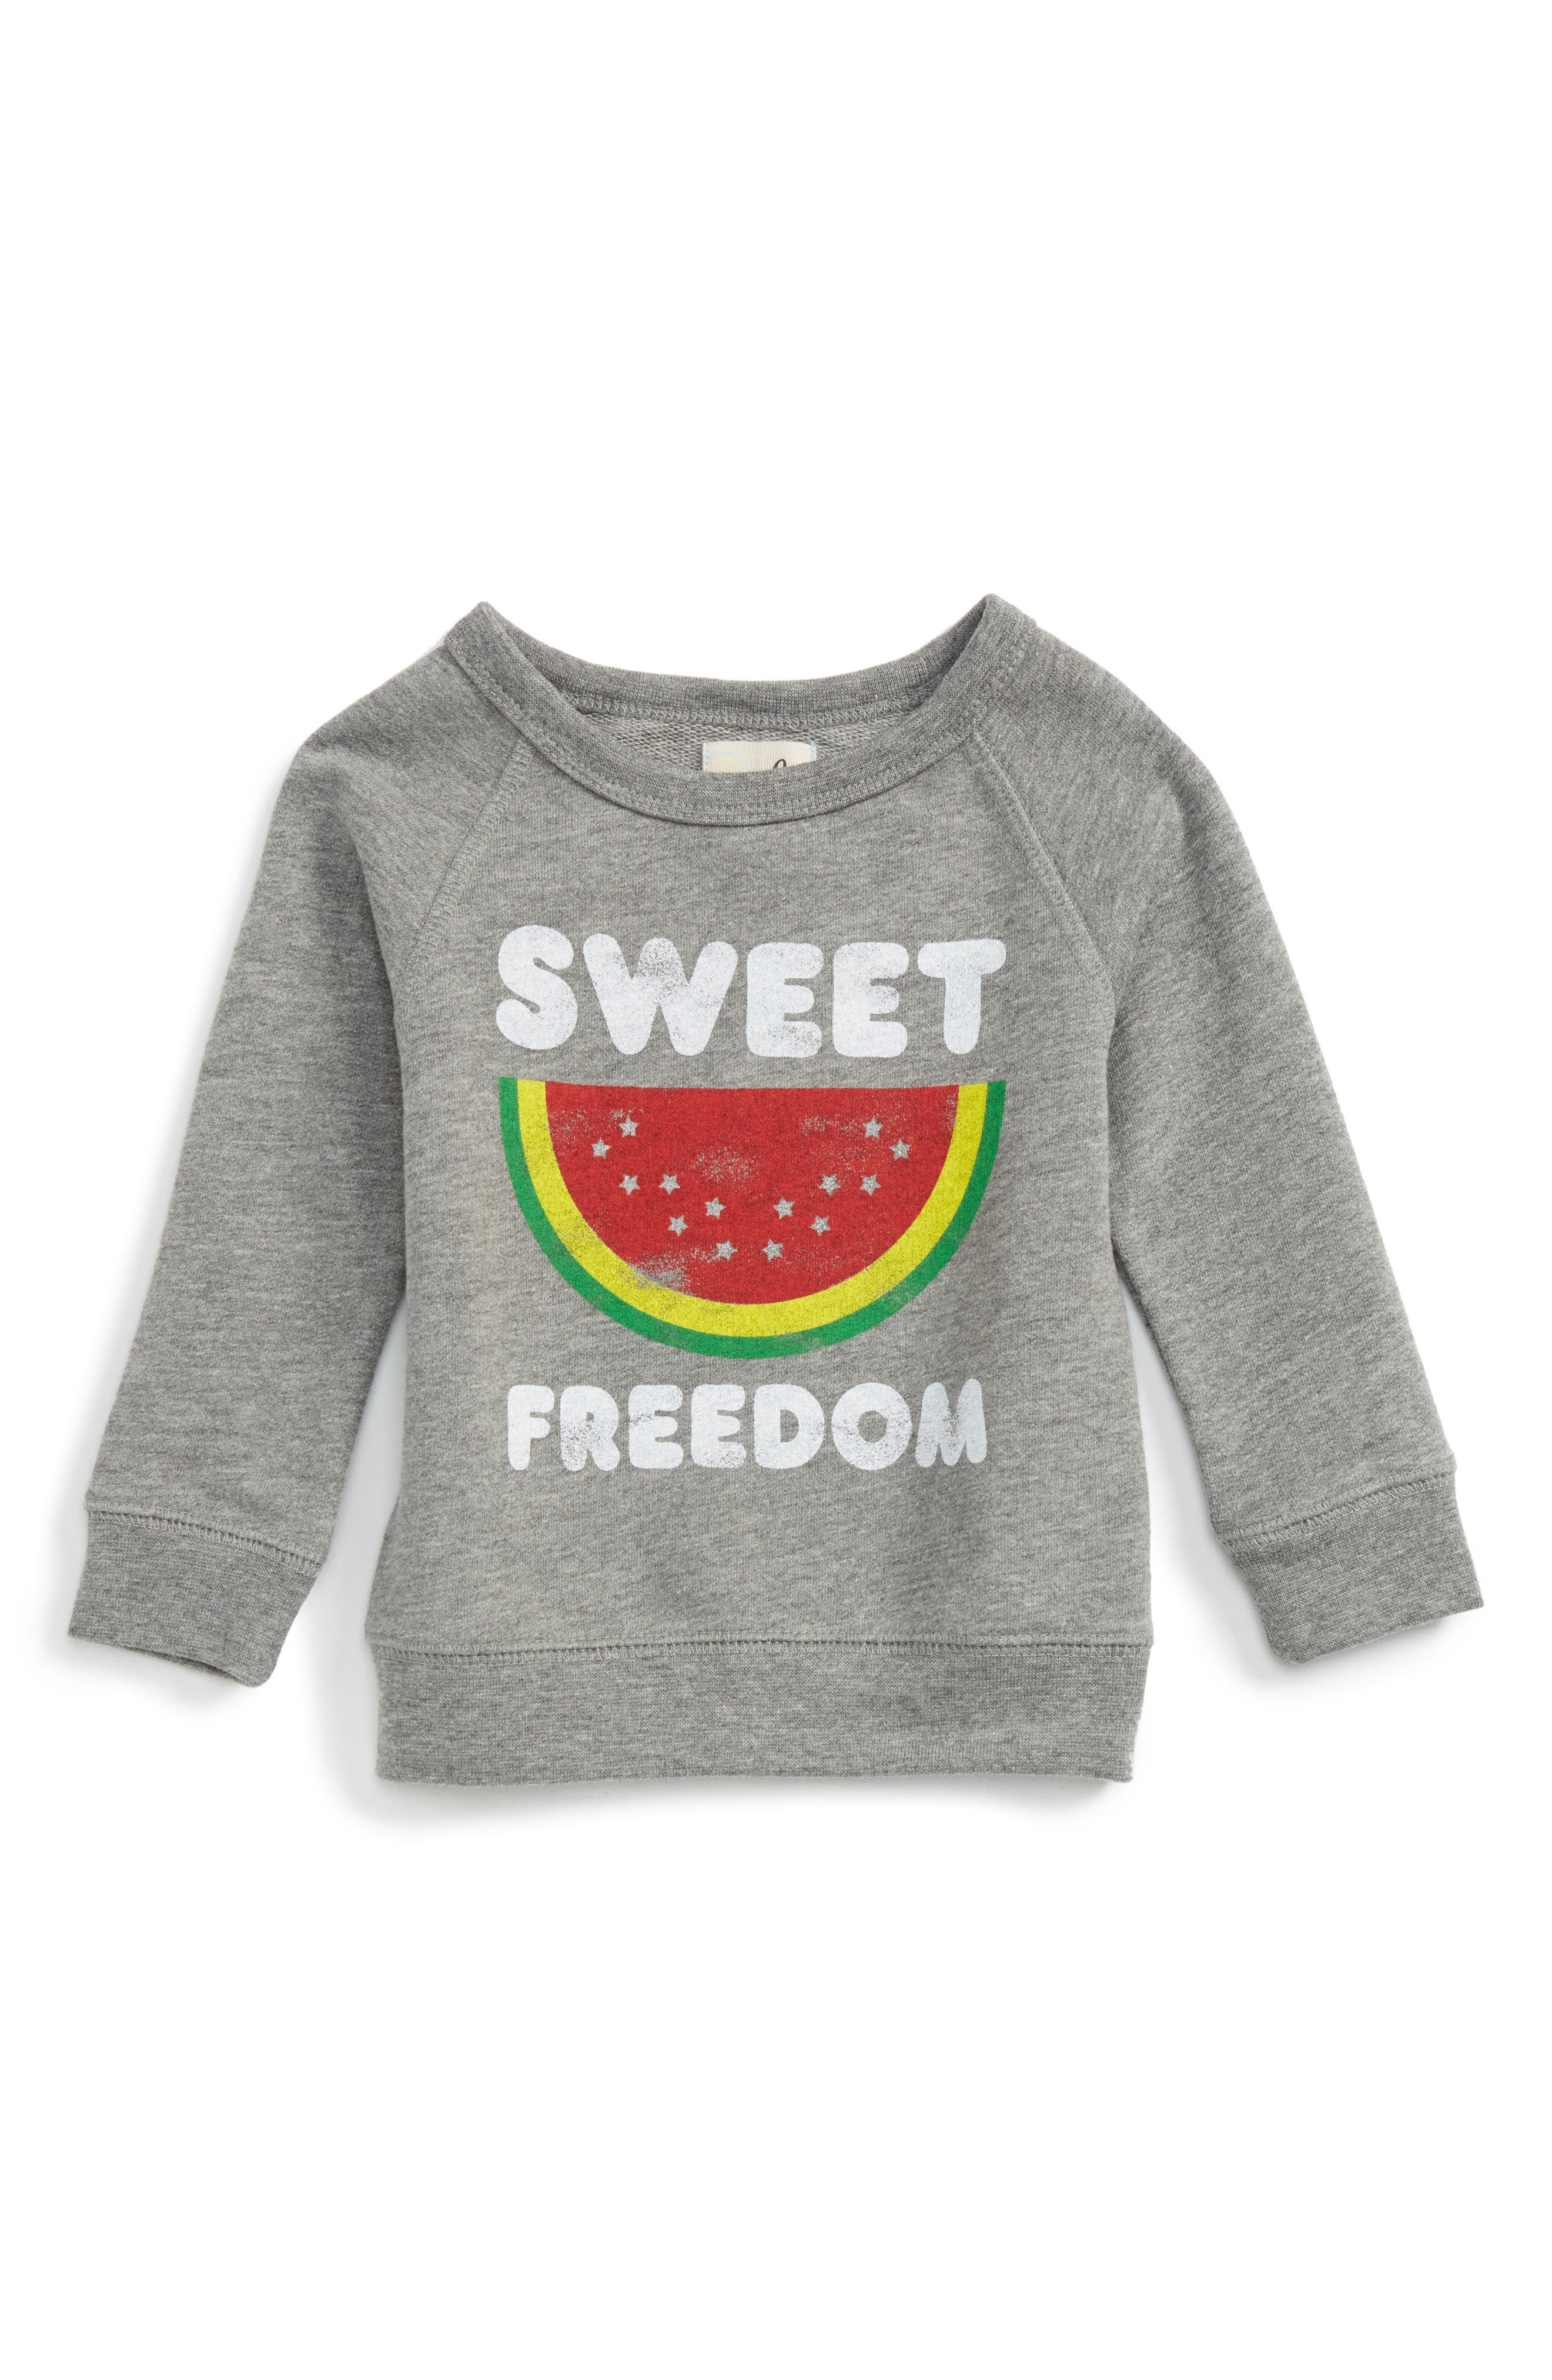 Main Image - Peek Sweet Freedom Sweatshirt (Baby)